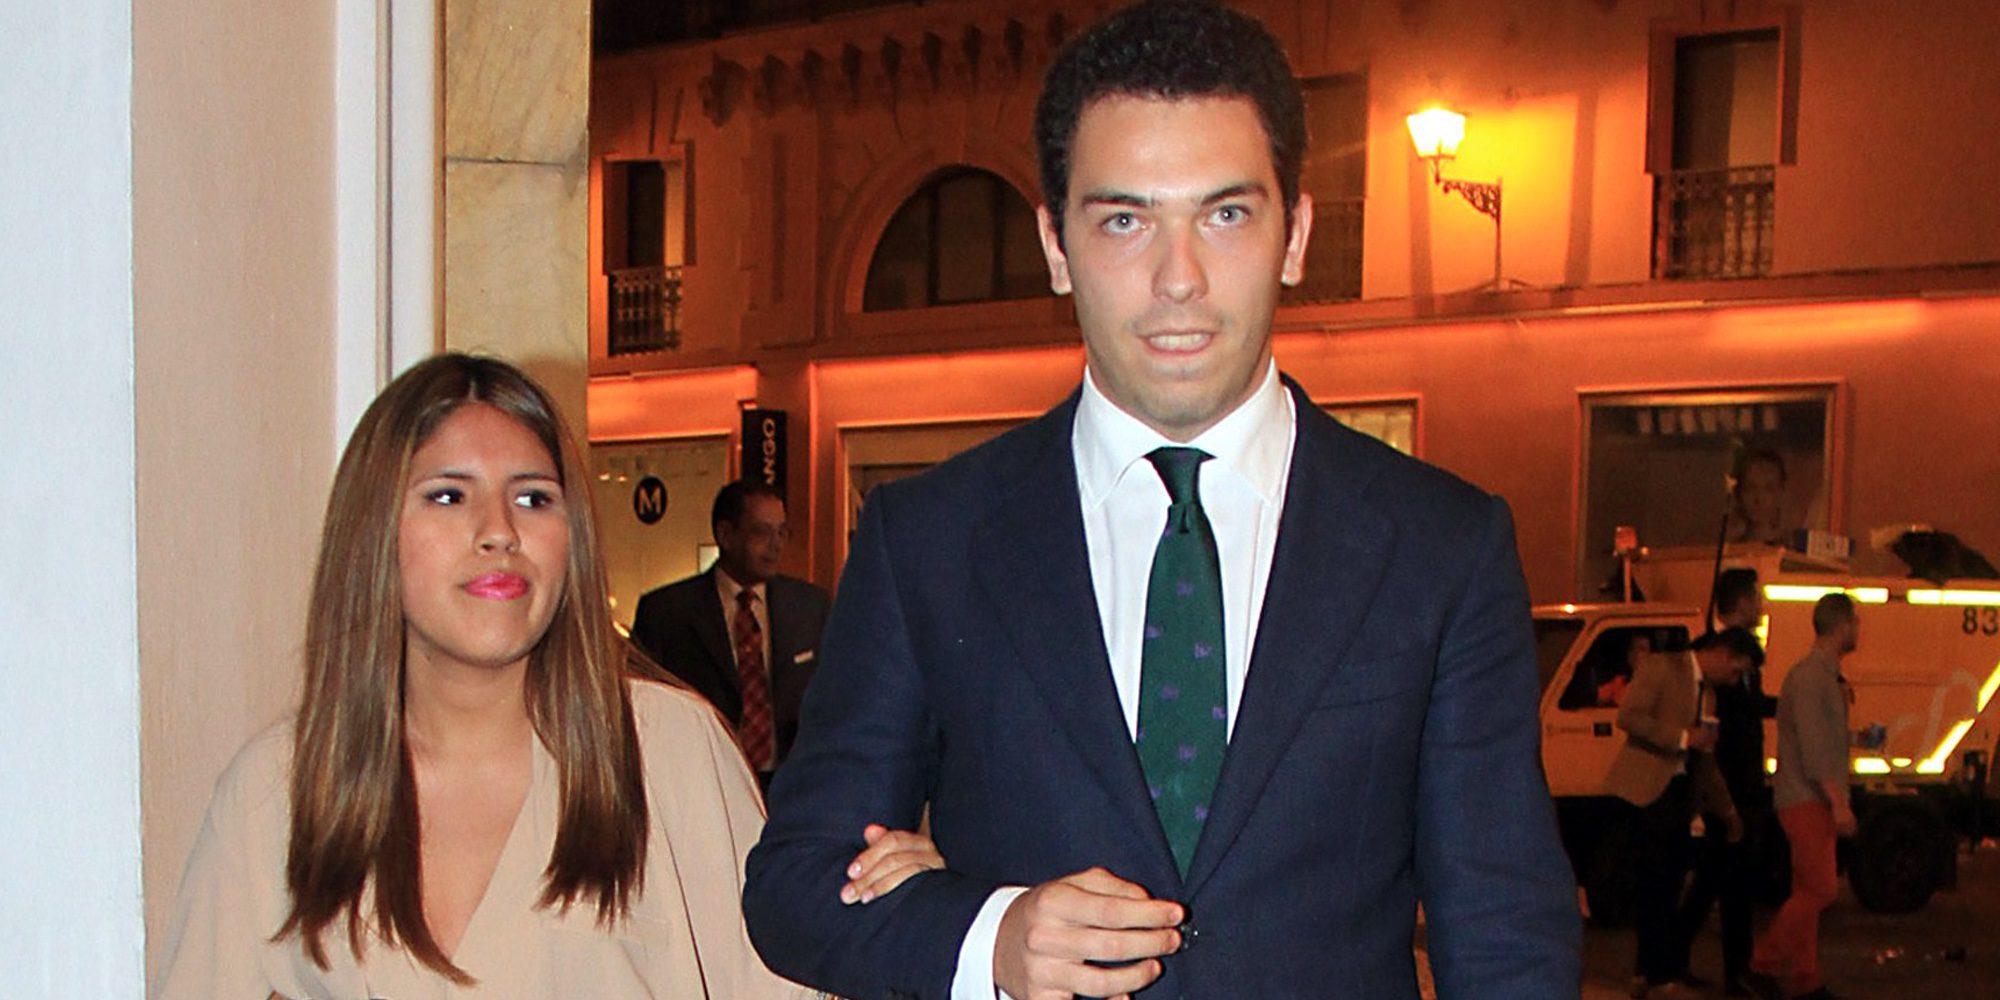 Chabelita confiesa a golpe de exclusiva que ha vuelto con Alberto Isla